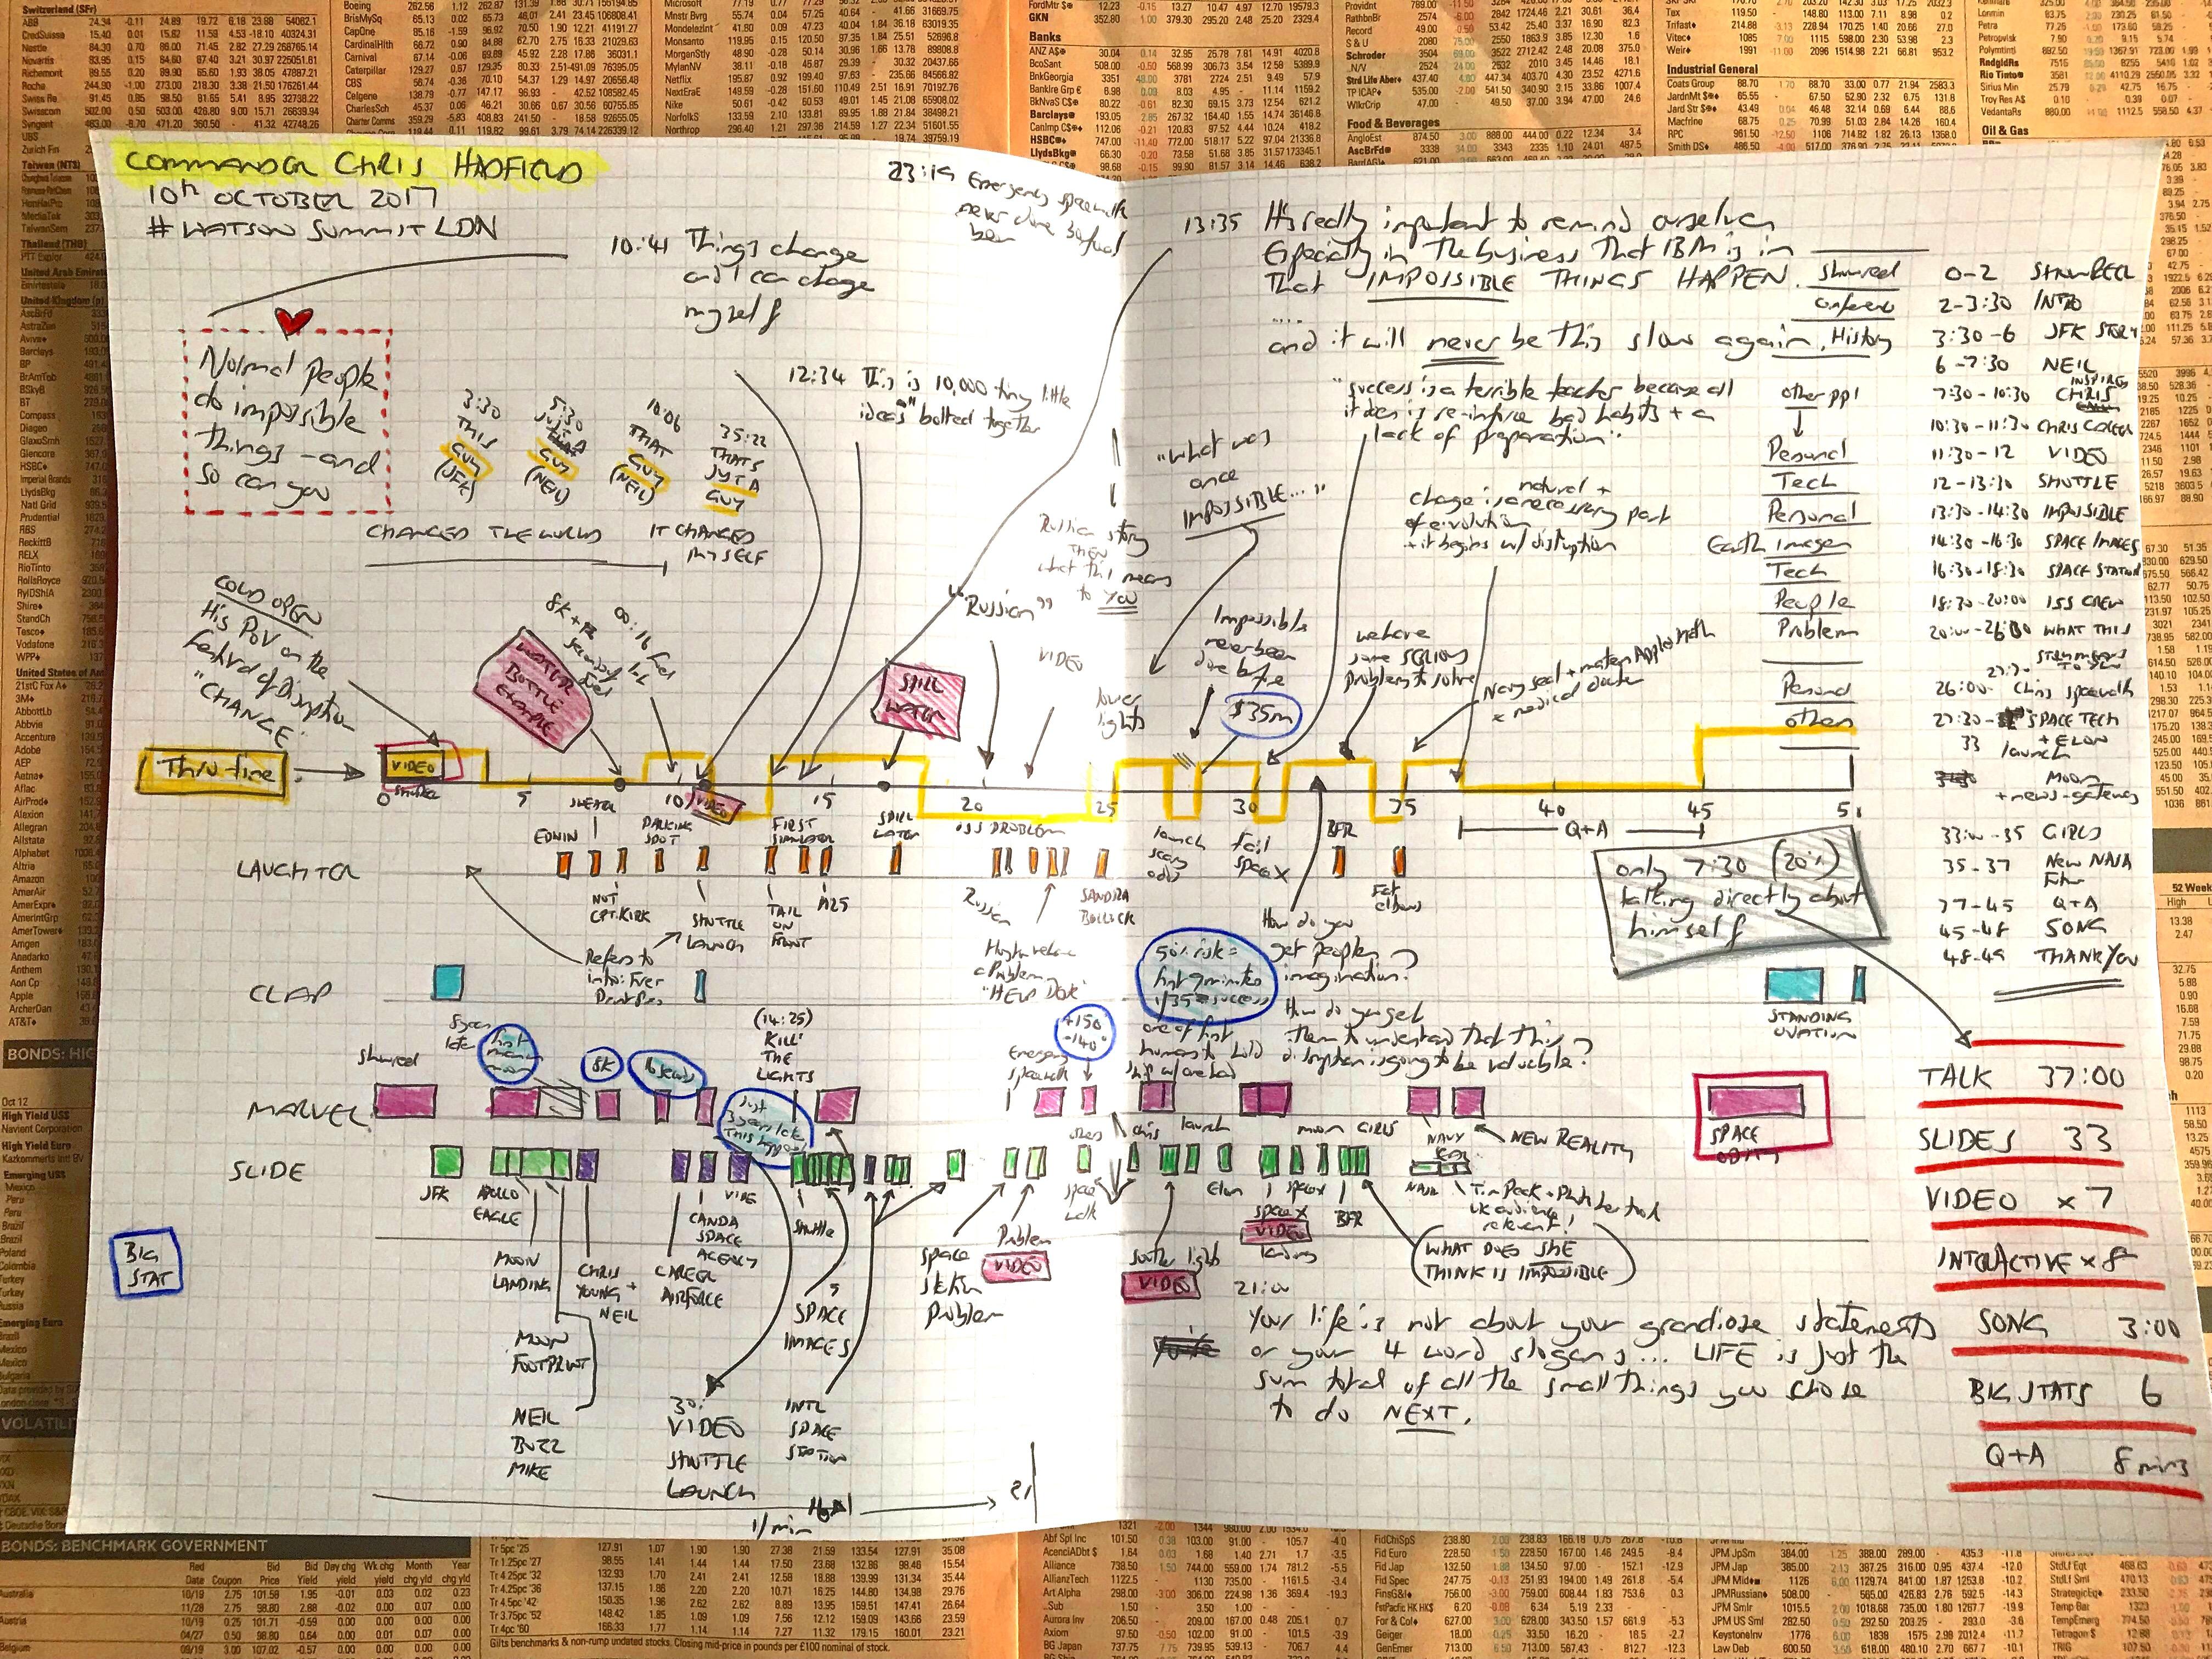 THINK Chris Hadfield IBM Jeremy's notes